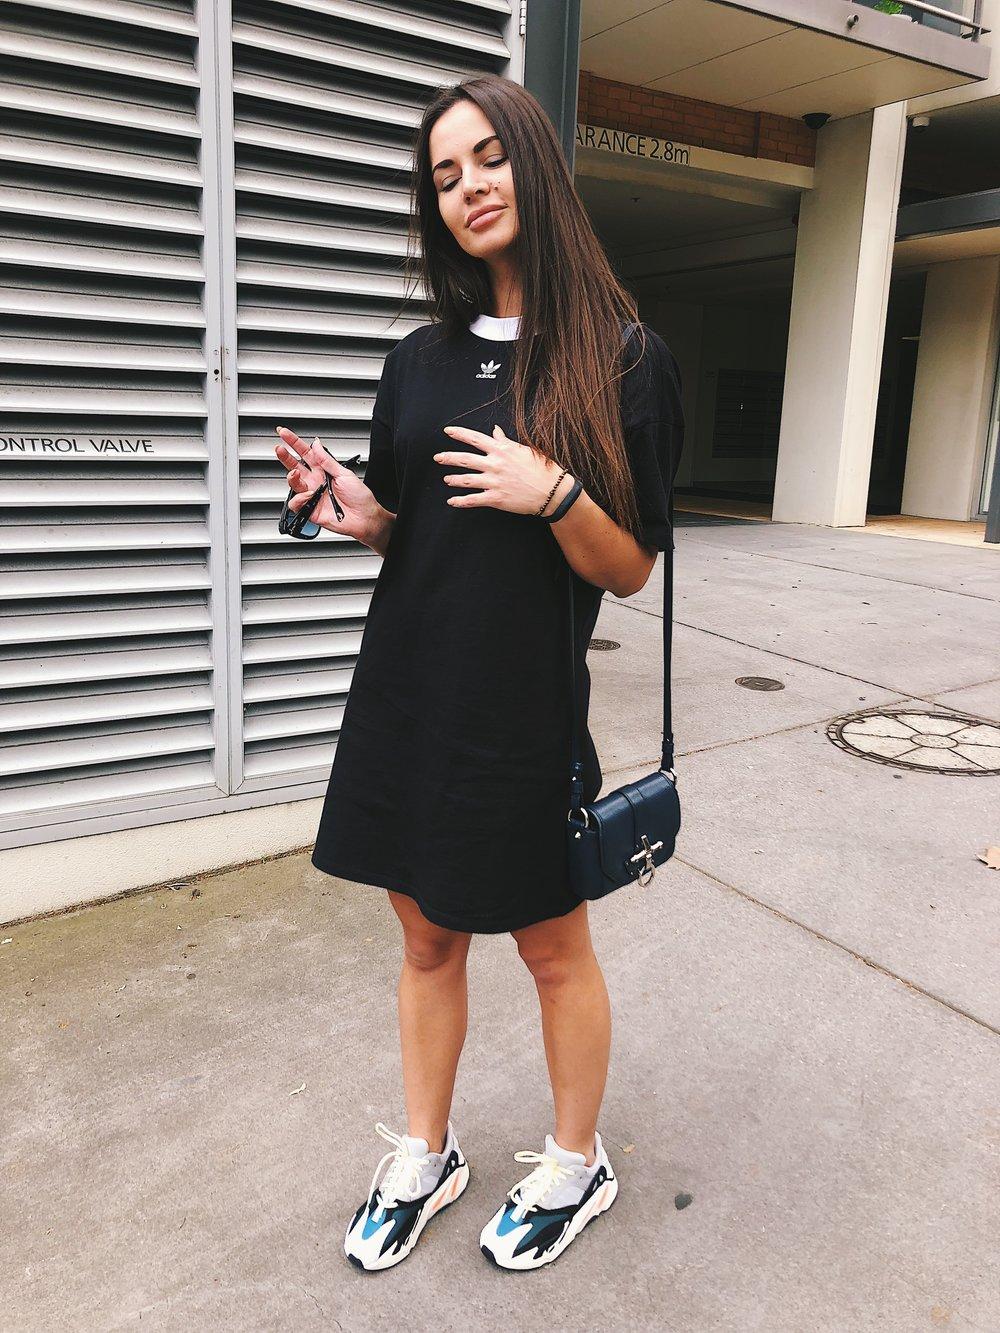 Adidas XL t,shirt dress Givenchy obsedia bag Adidas Yeezy 700 sneakers